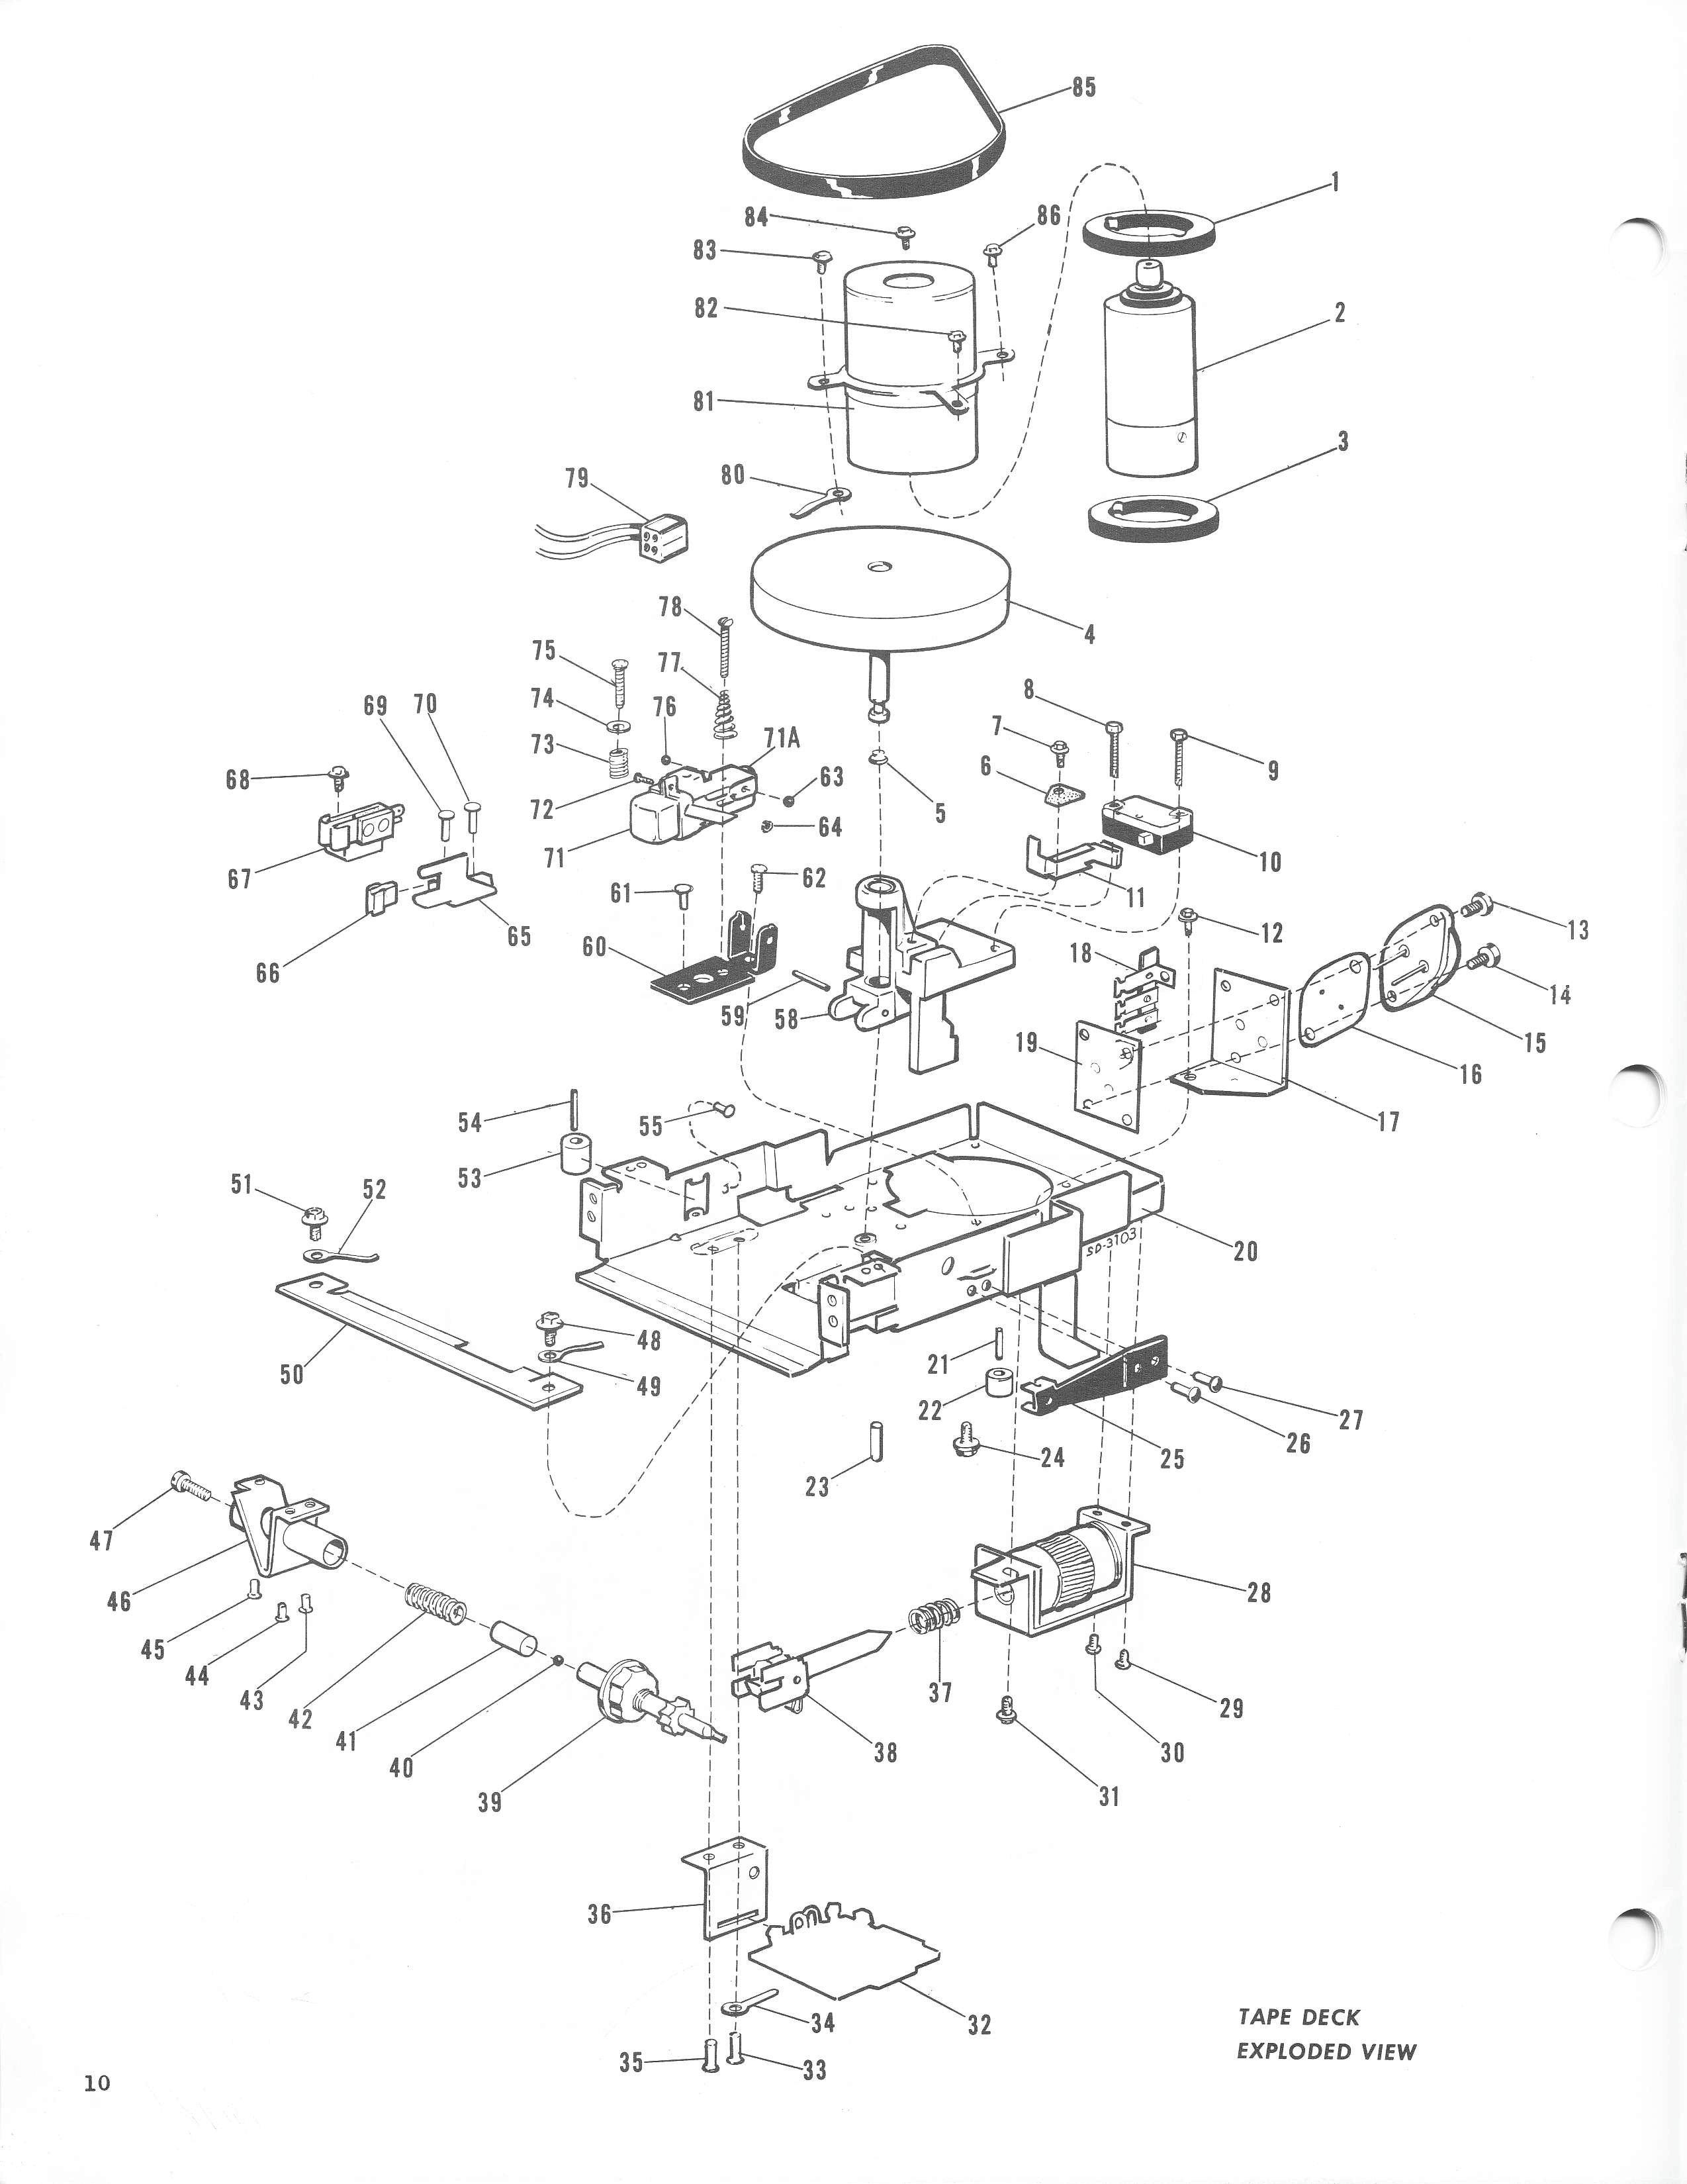 TheSamba.com :: 1967 Motorola Sapphire VIII with Tape